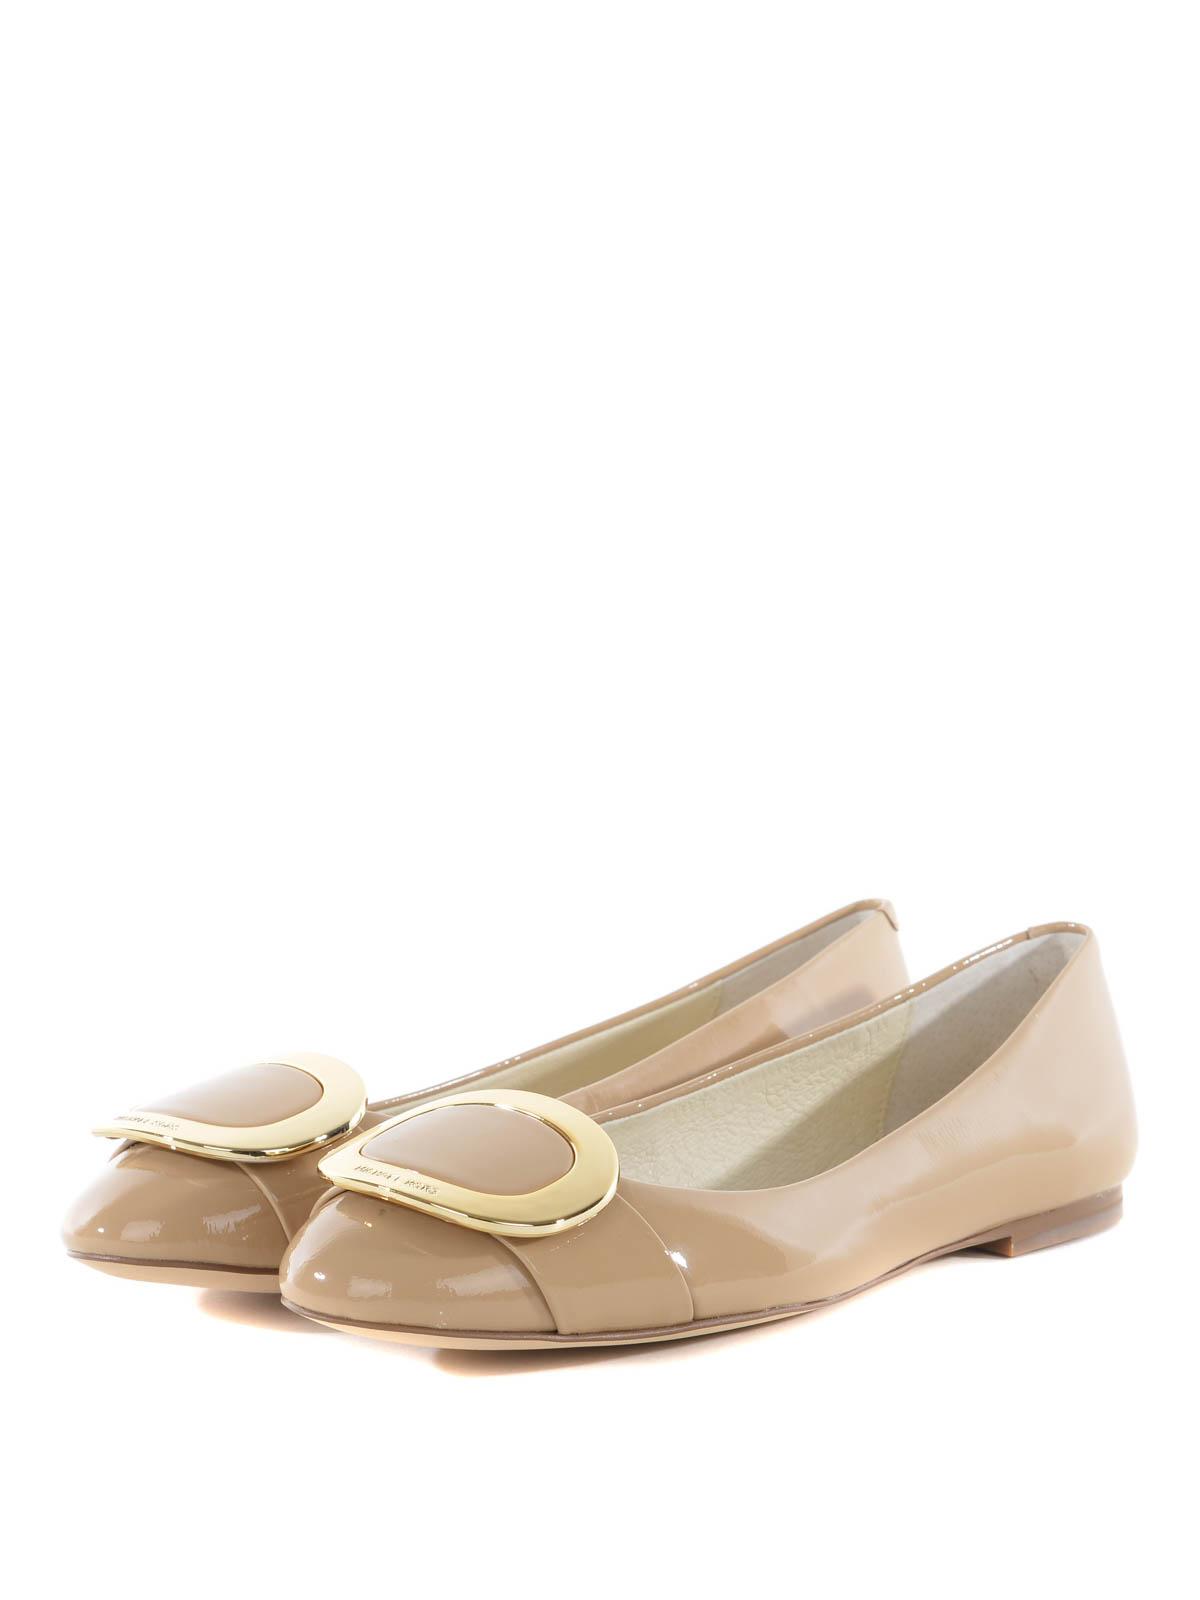 pauline ballet flats by michael kors flat shoes ikrix. Black Bedroom Furniture Sets. Home Design Ideas